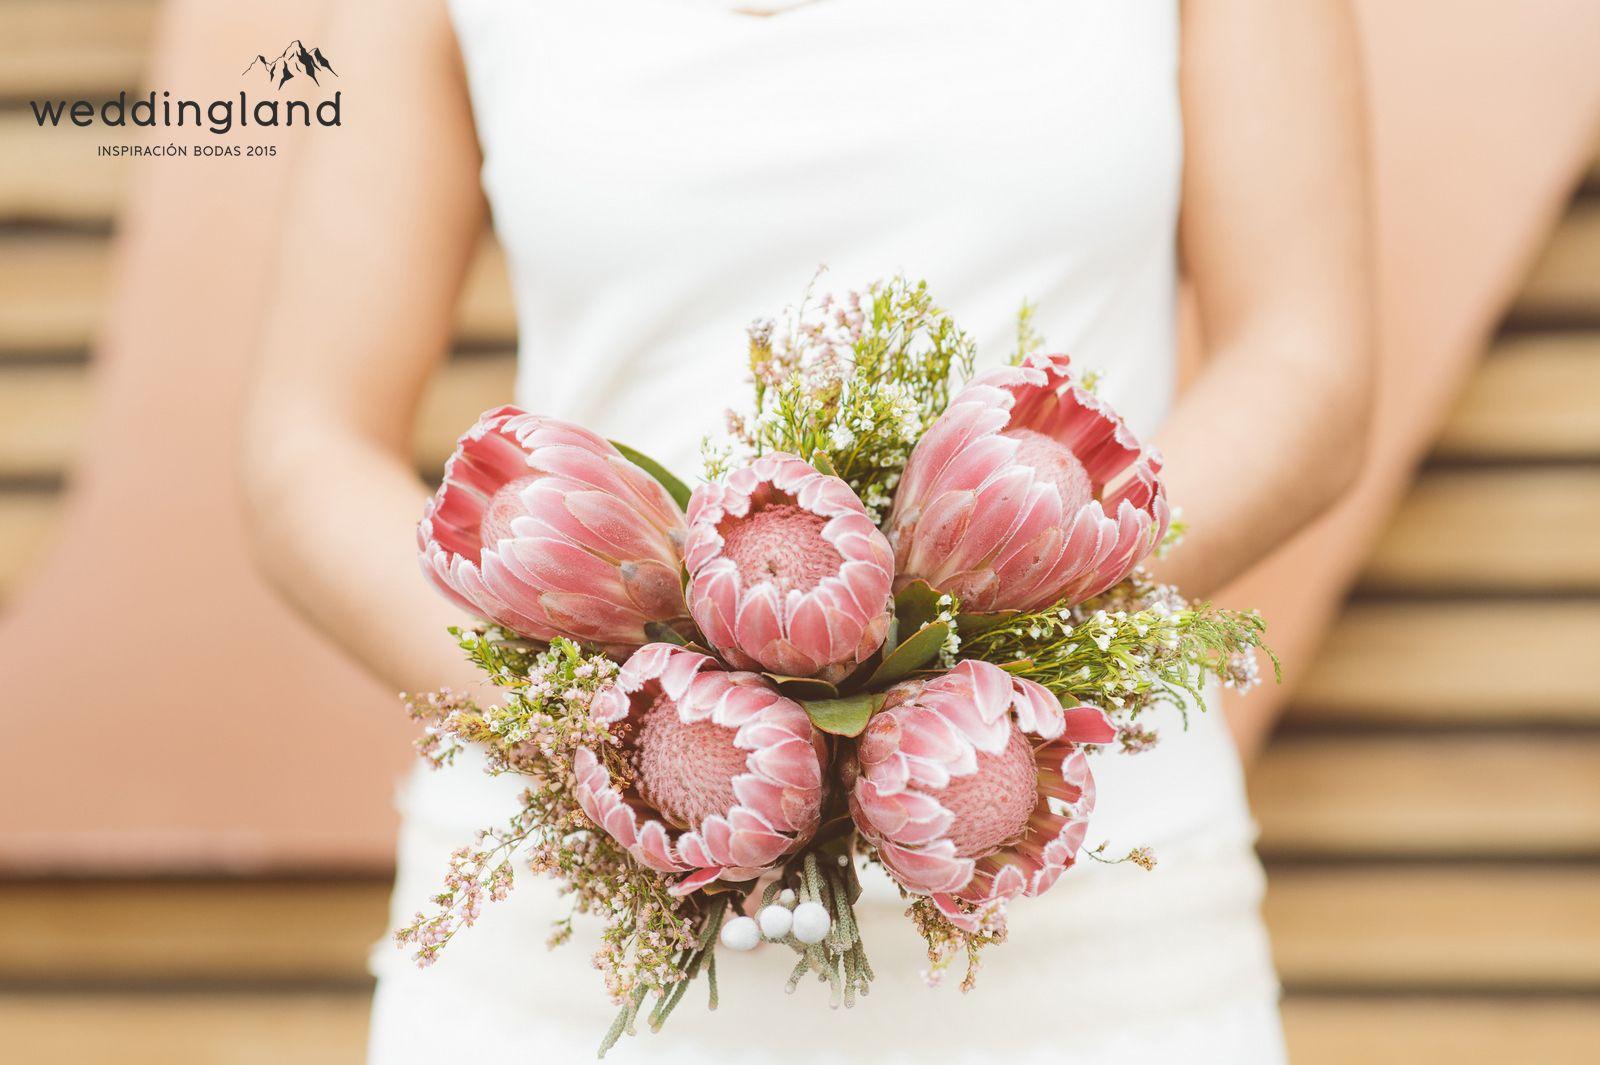 Ramo de novia | shooting weddinglan 2015